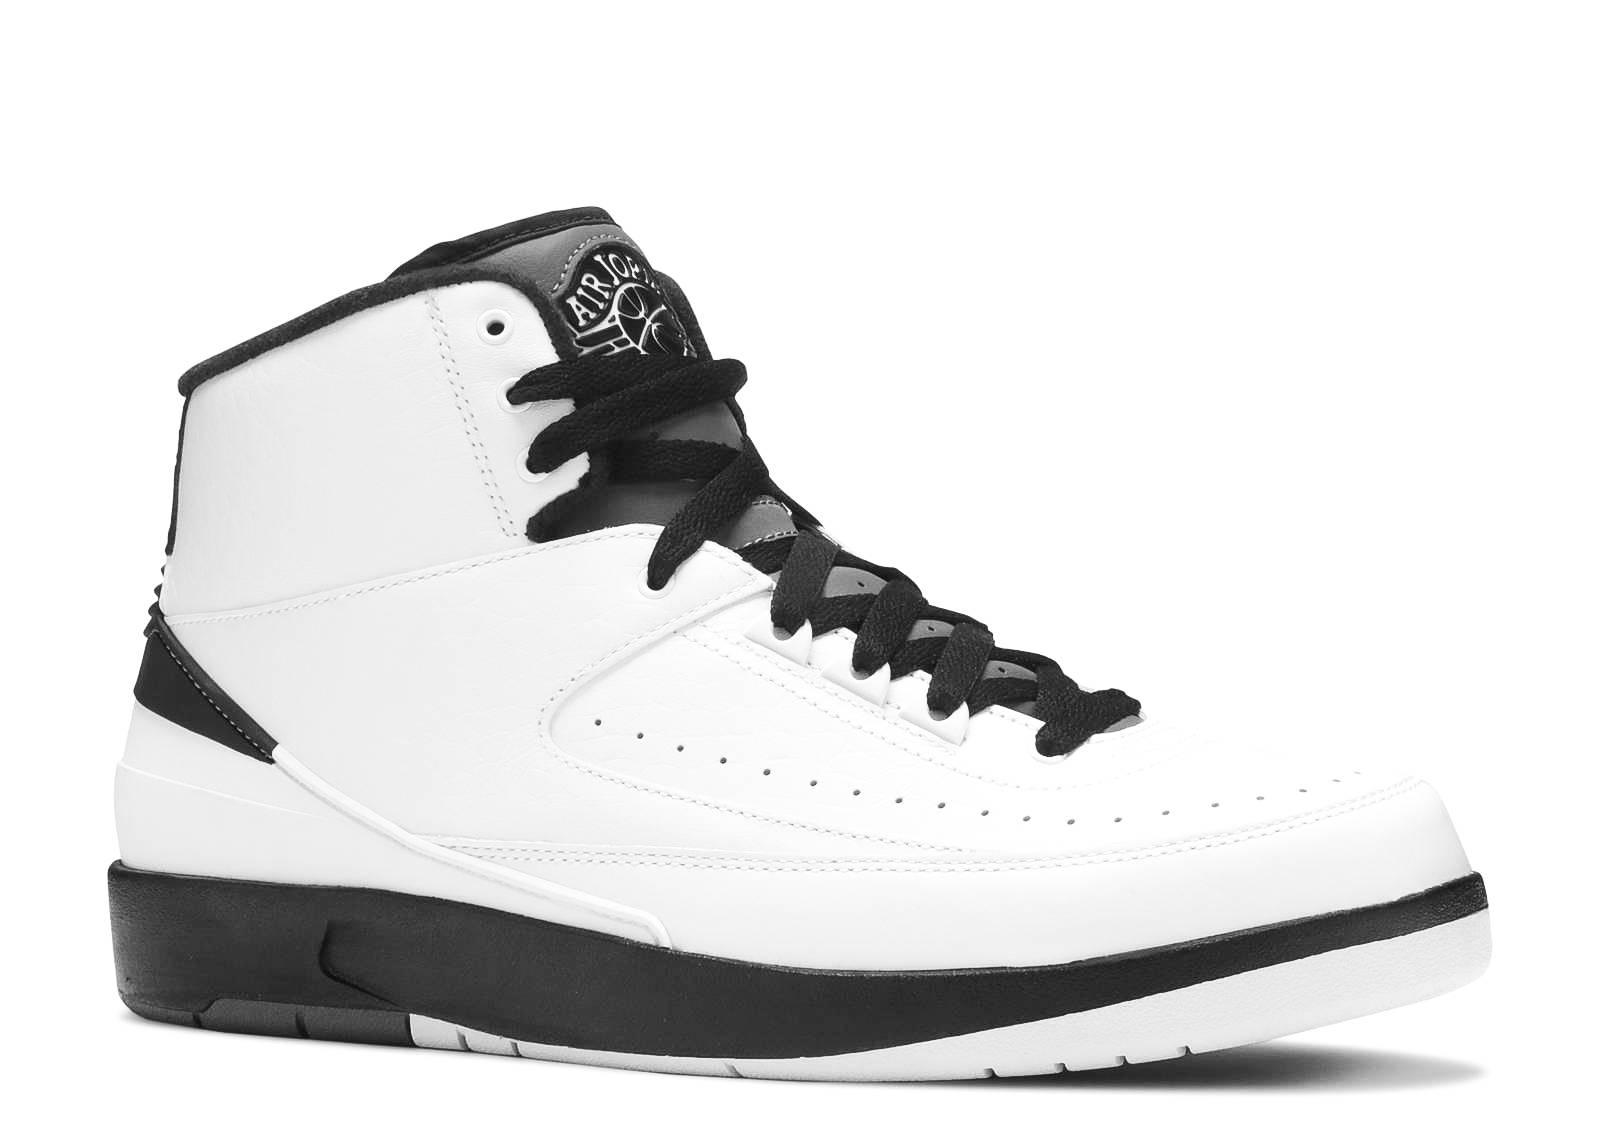 Air Jordan 2 Black